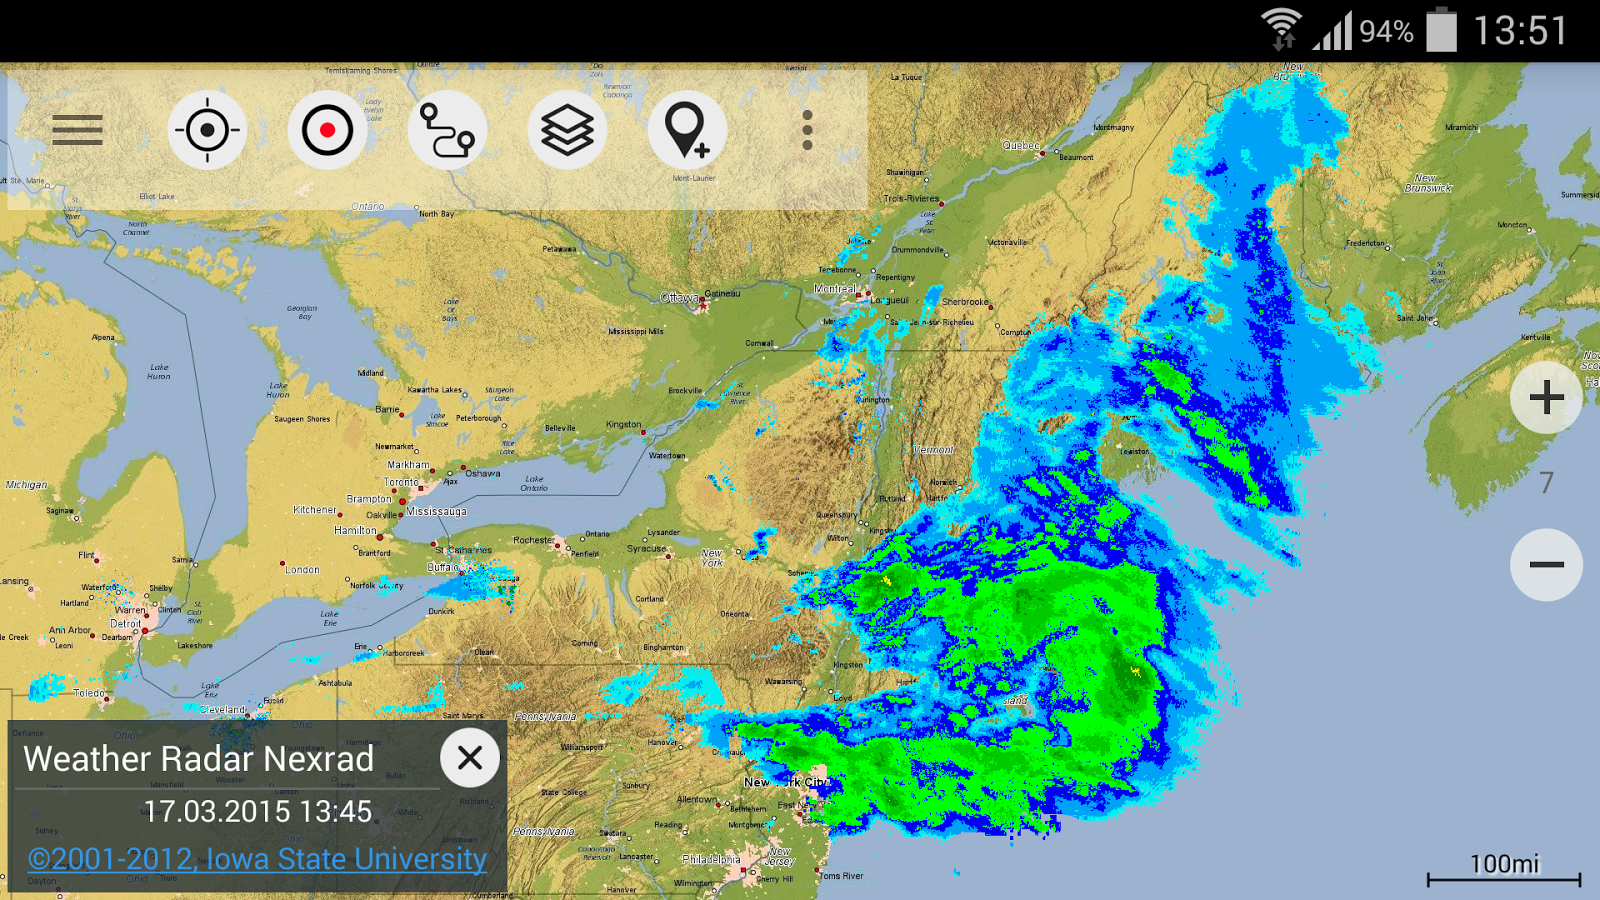 US Topo Maps Pro  APK Download Android Catsmapsnavigation - Us topographic map kmz